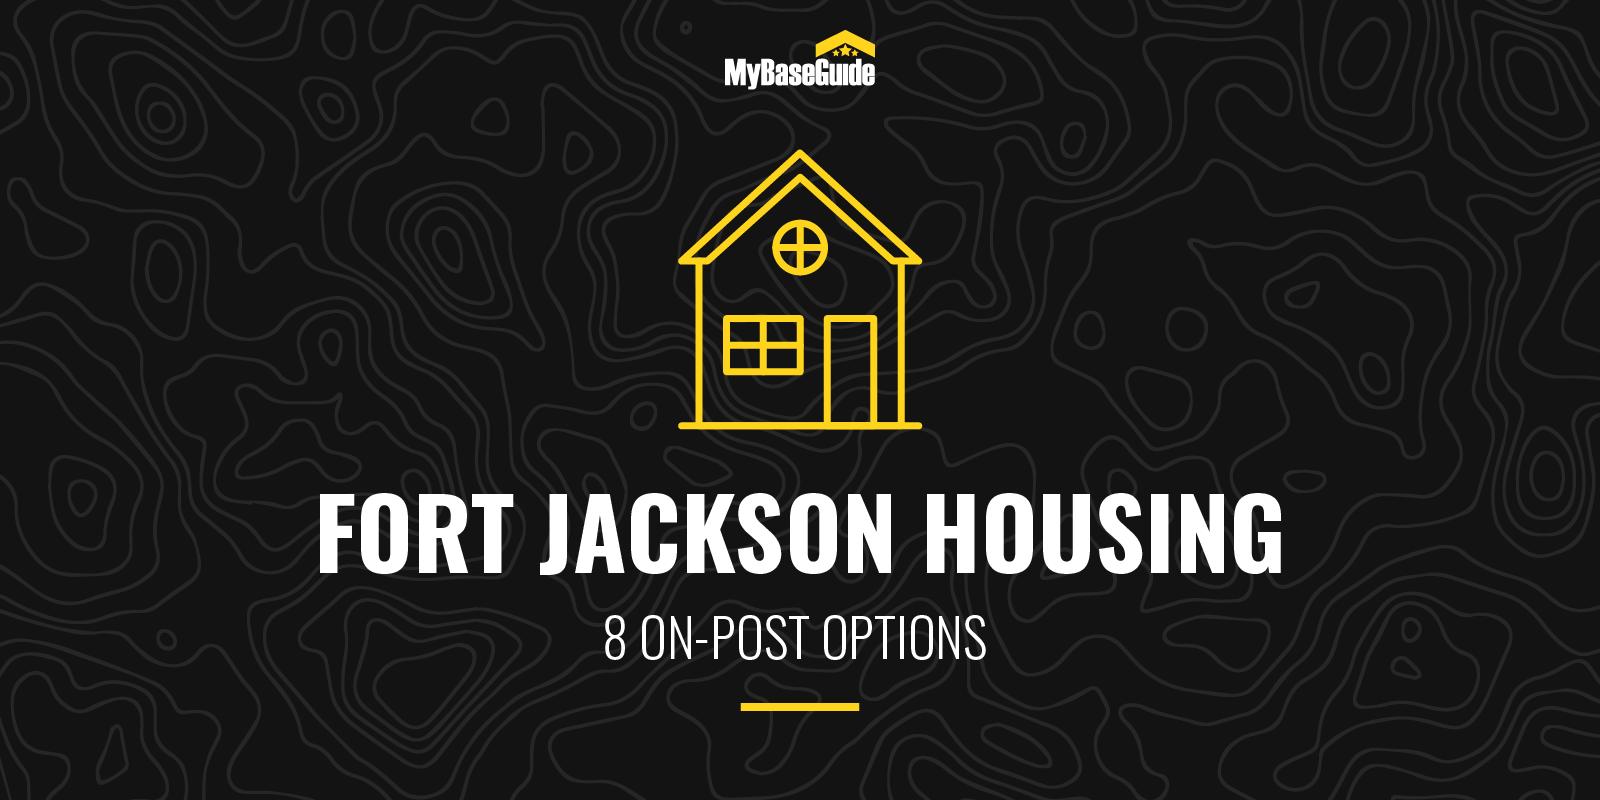 Fort Jackson Housing: 8 On Post Options